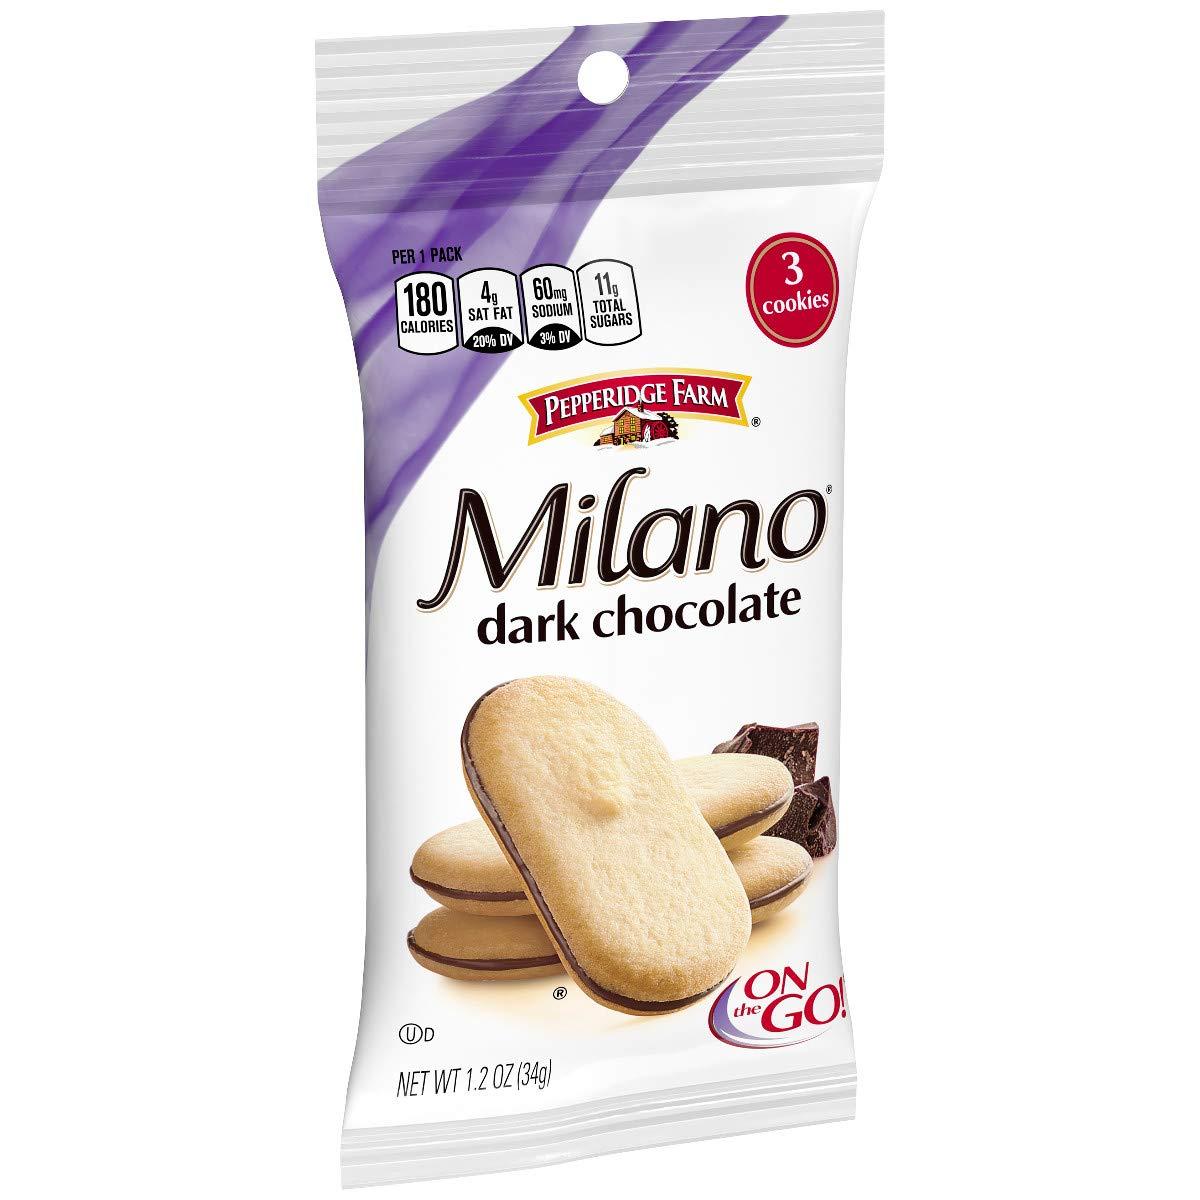 Pepperidge Farm, Milano, Cookies, Dark Chocolate, 1.2 oz, 36-count